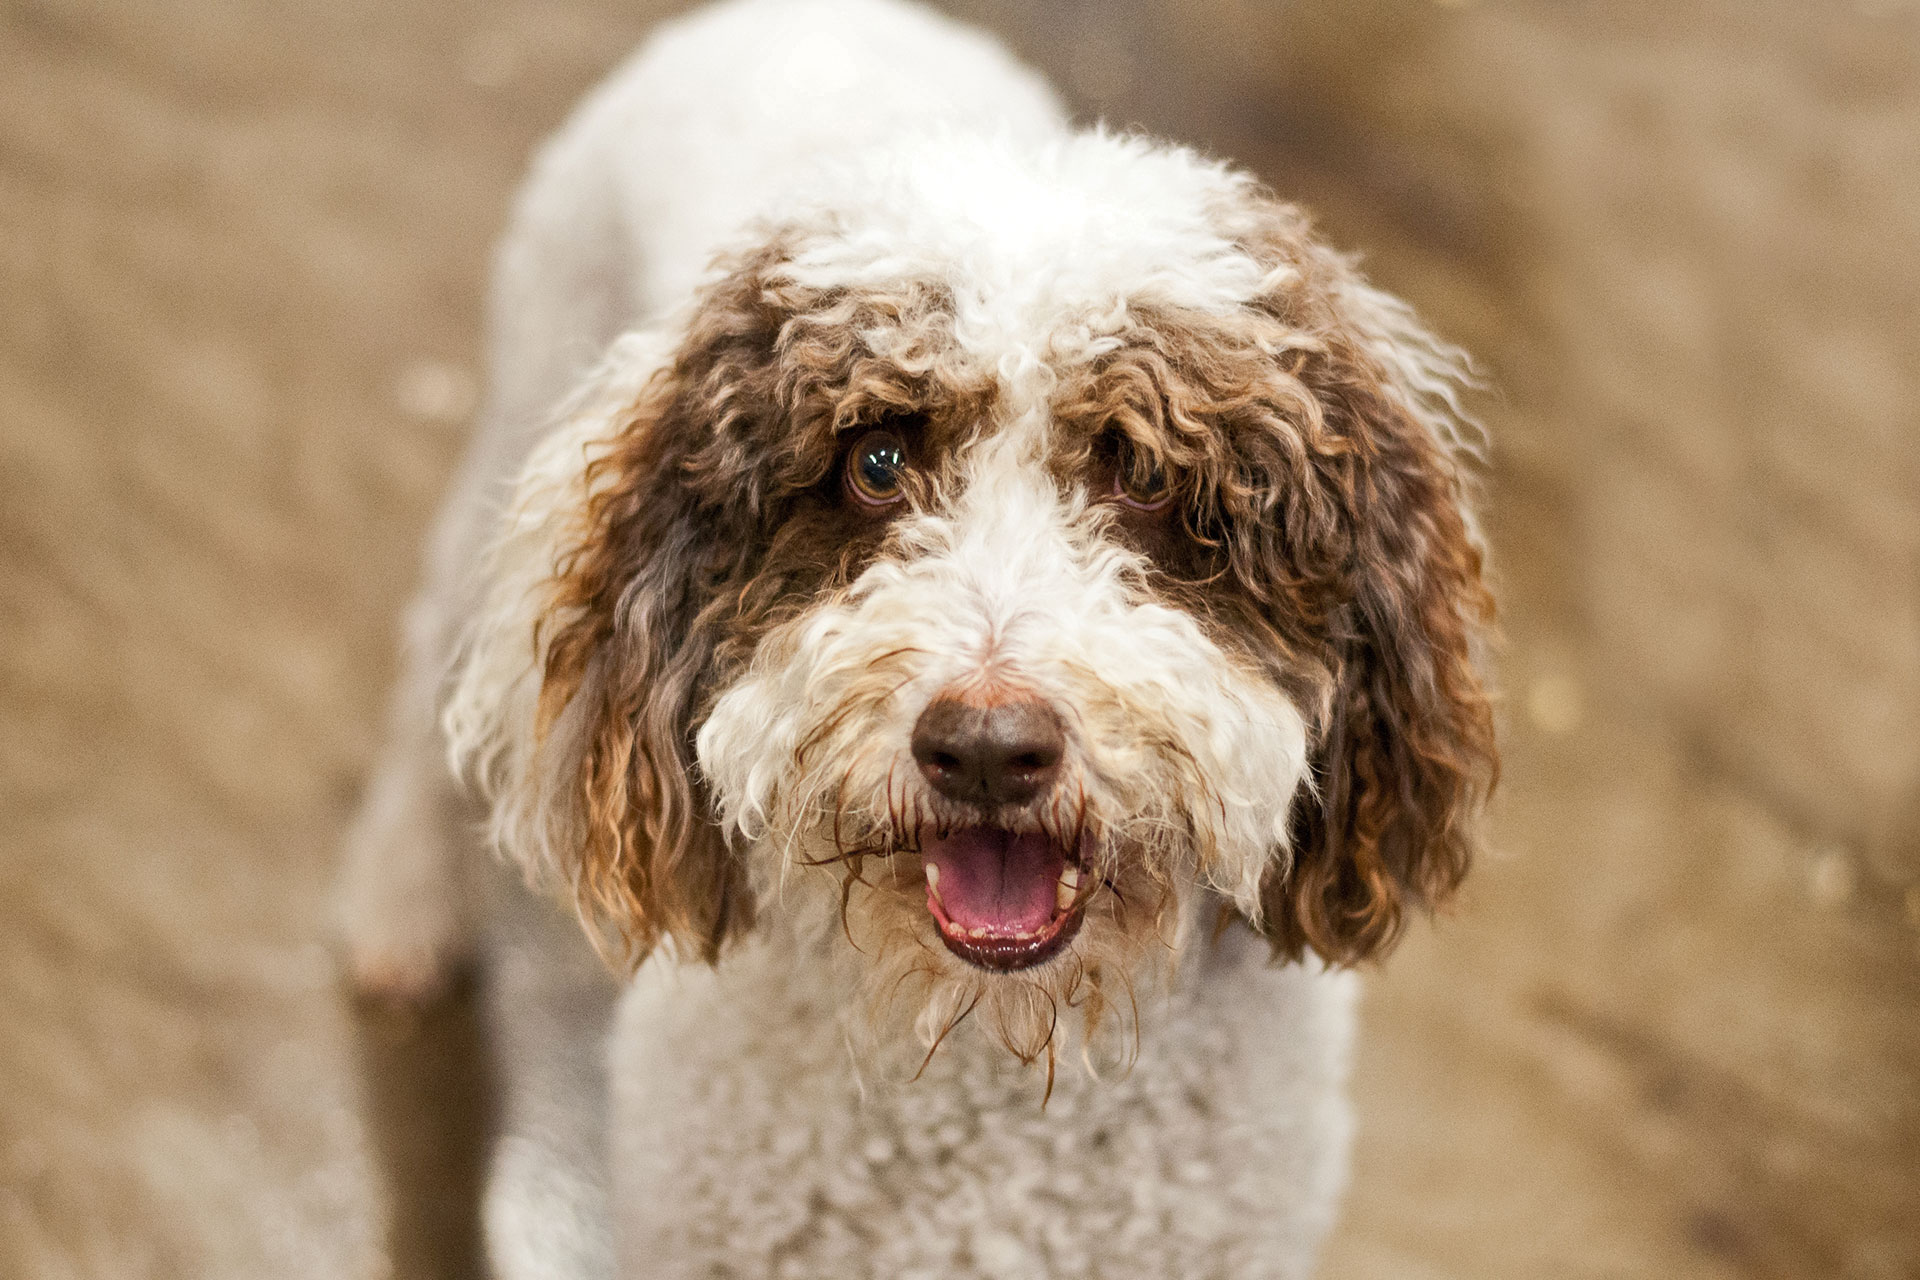 7 dog breeds that like water- Irish water spaniel